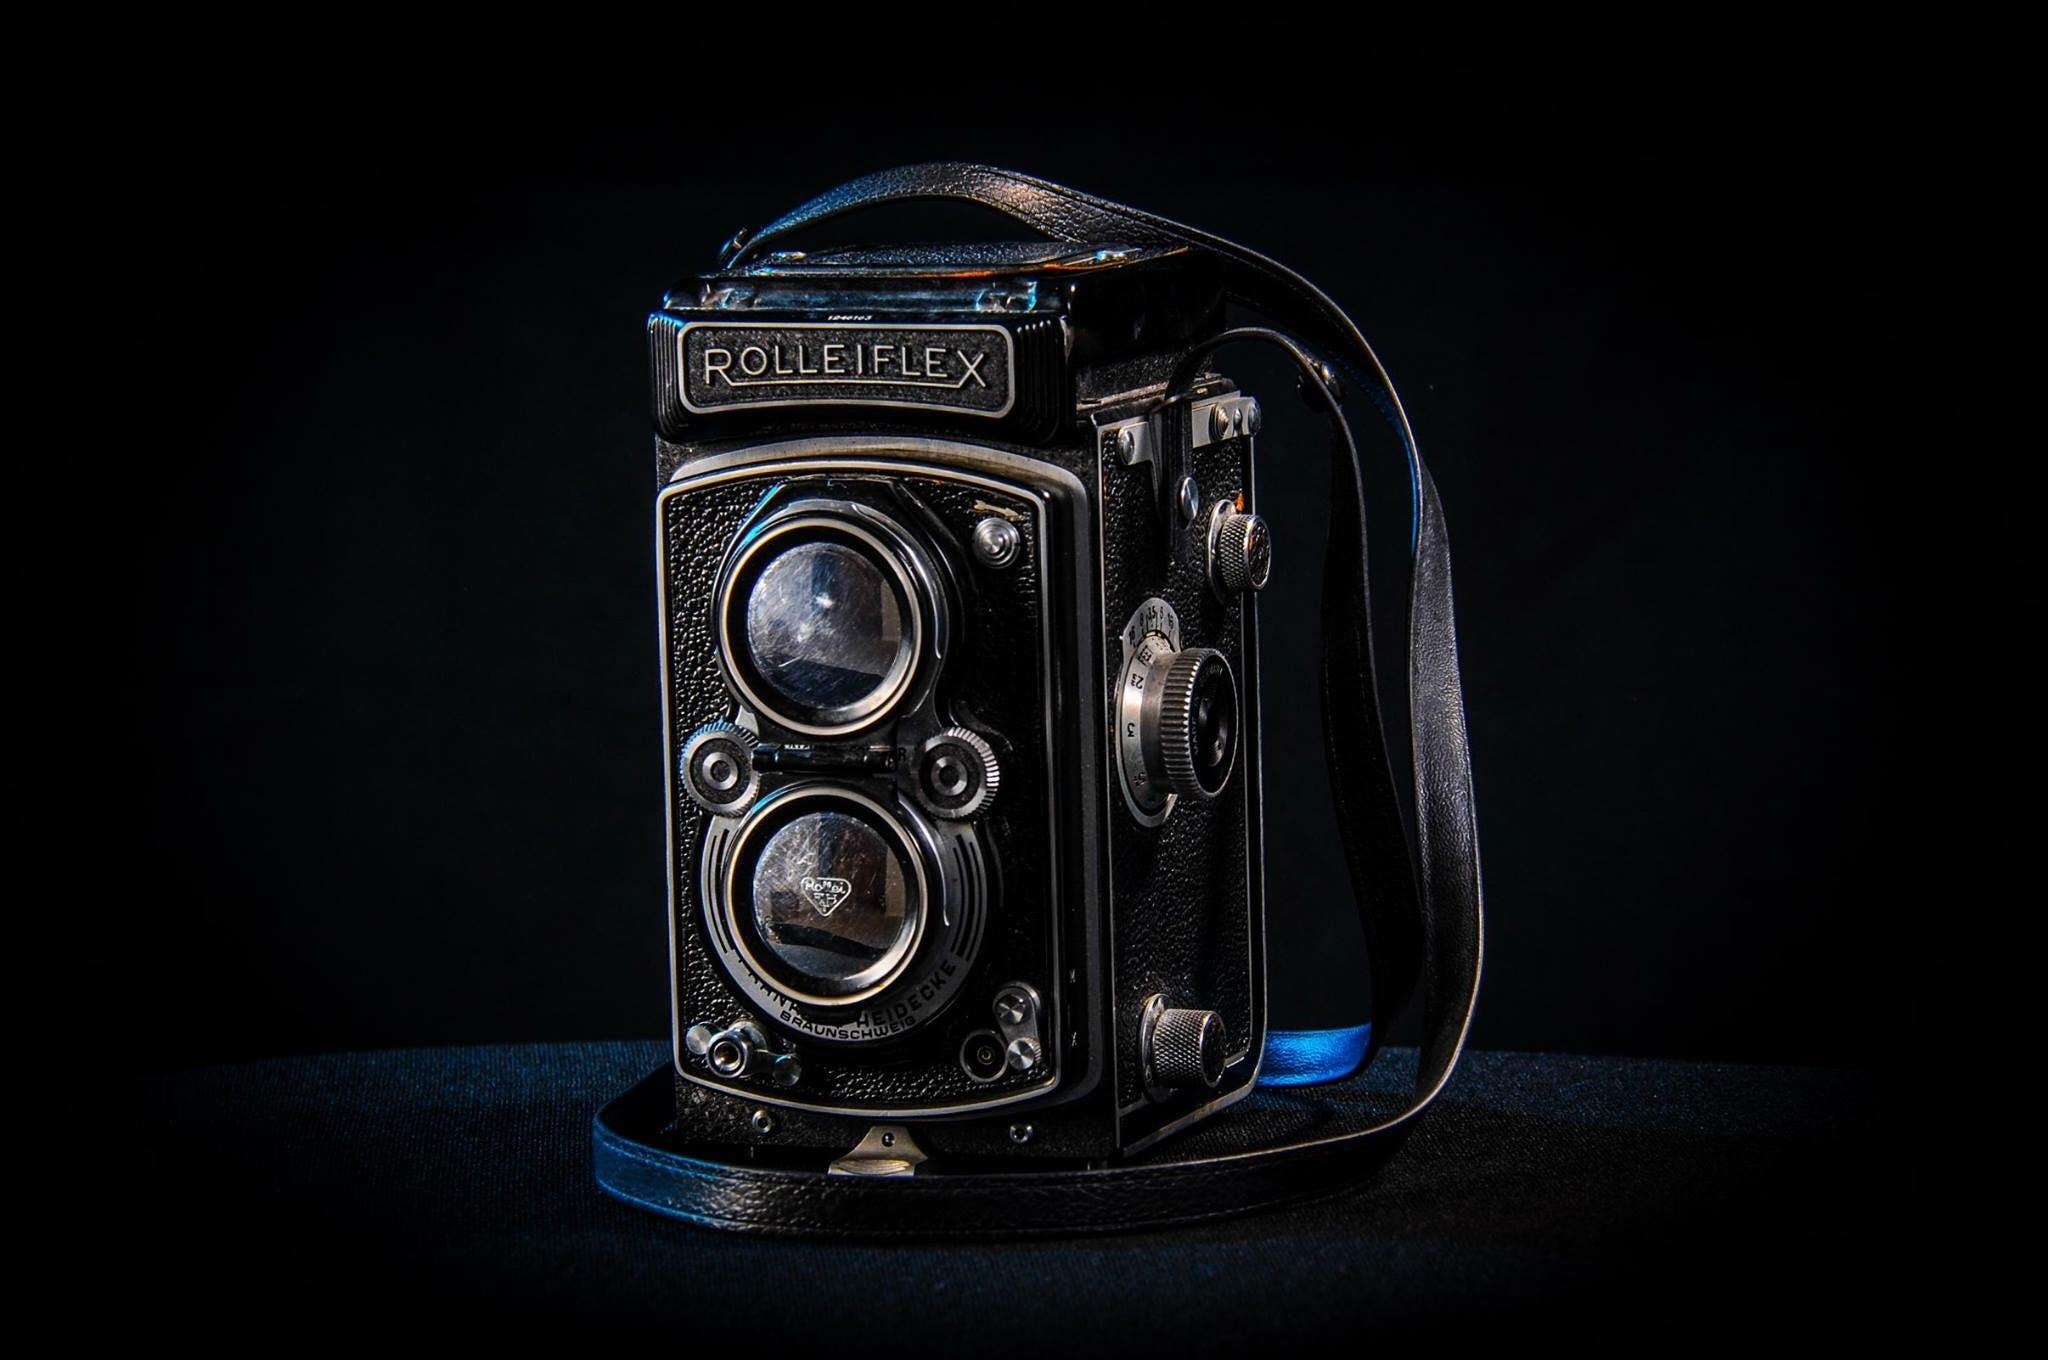 Black Device in Closeup Photo